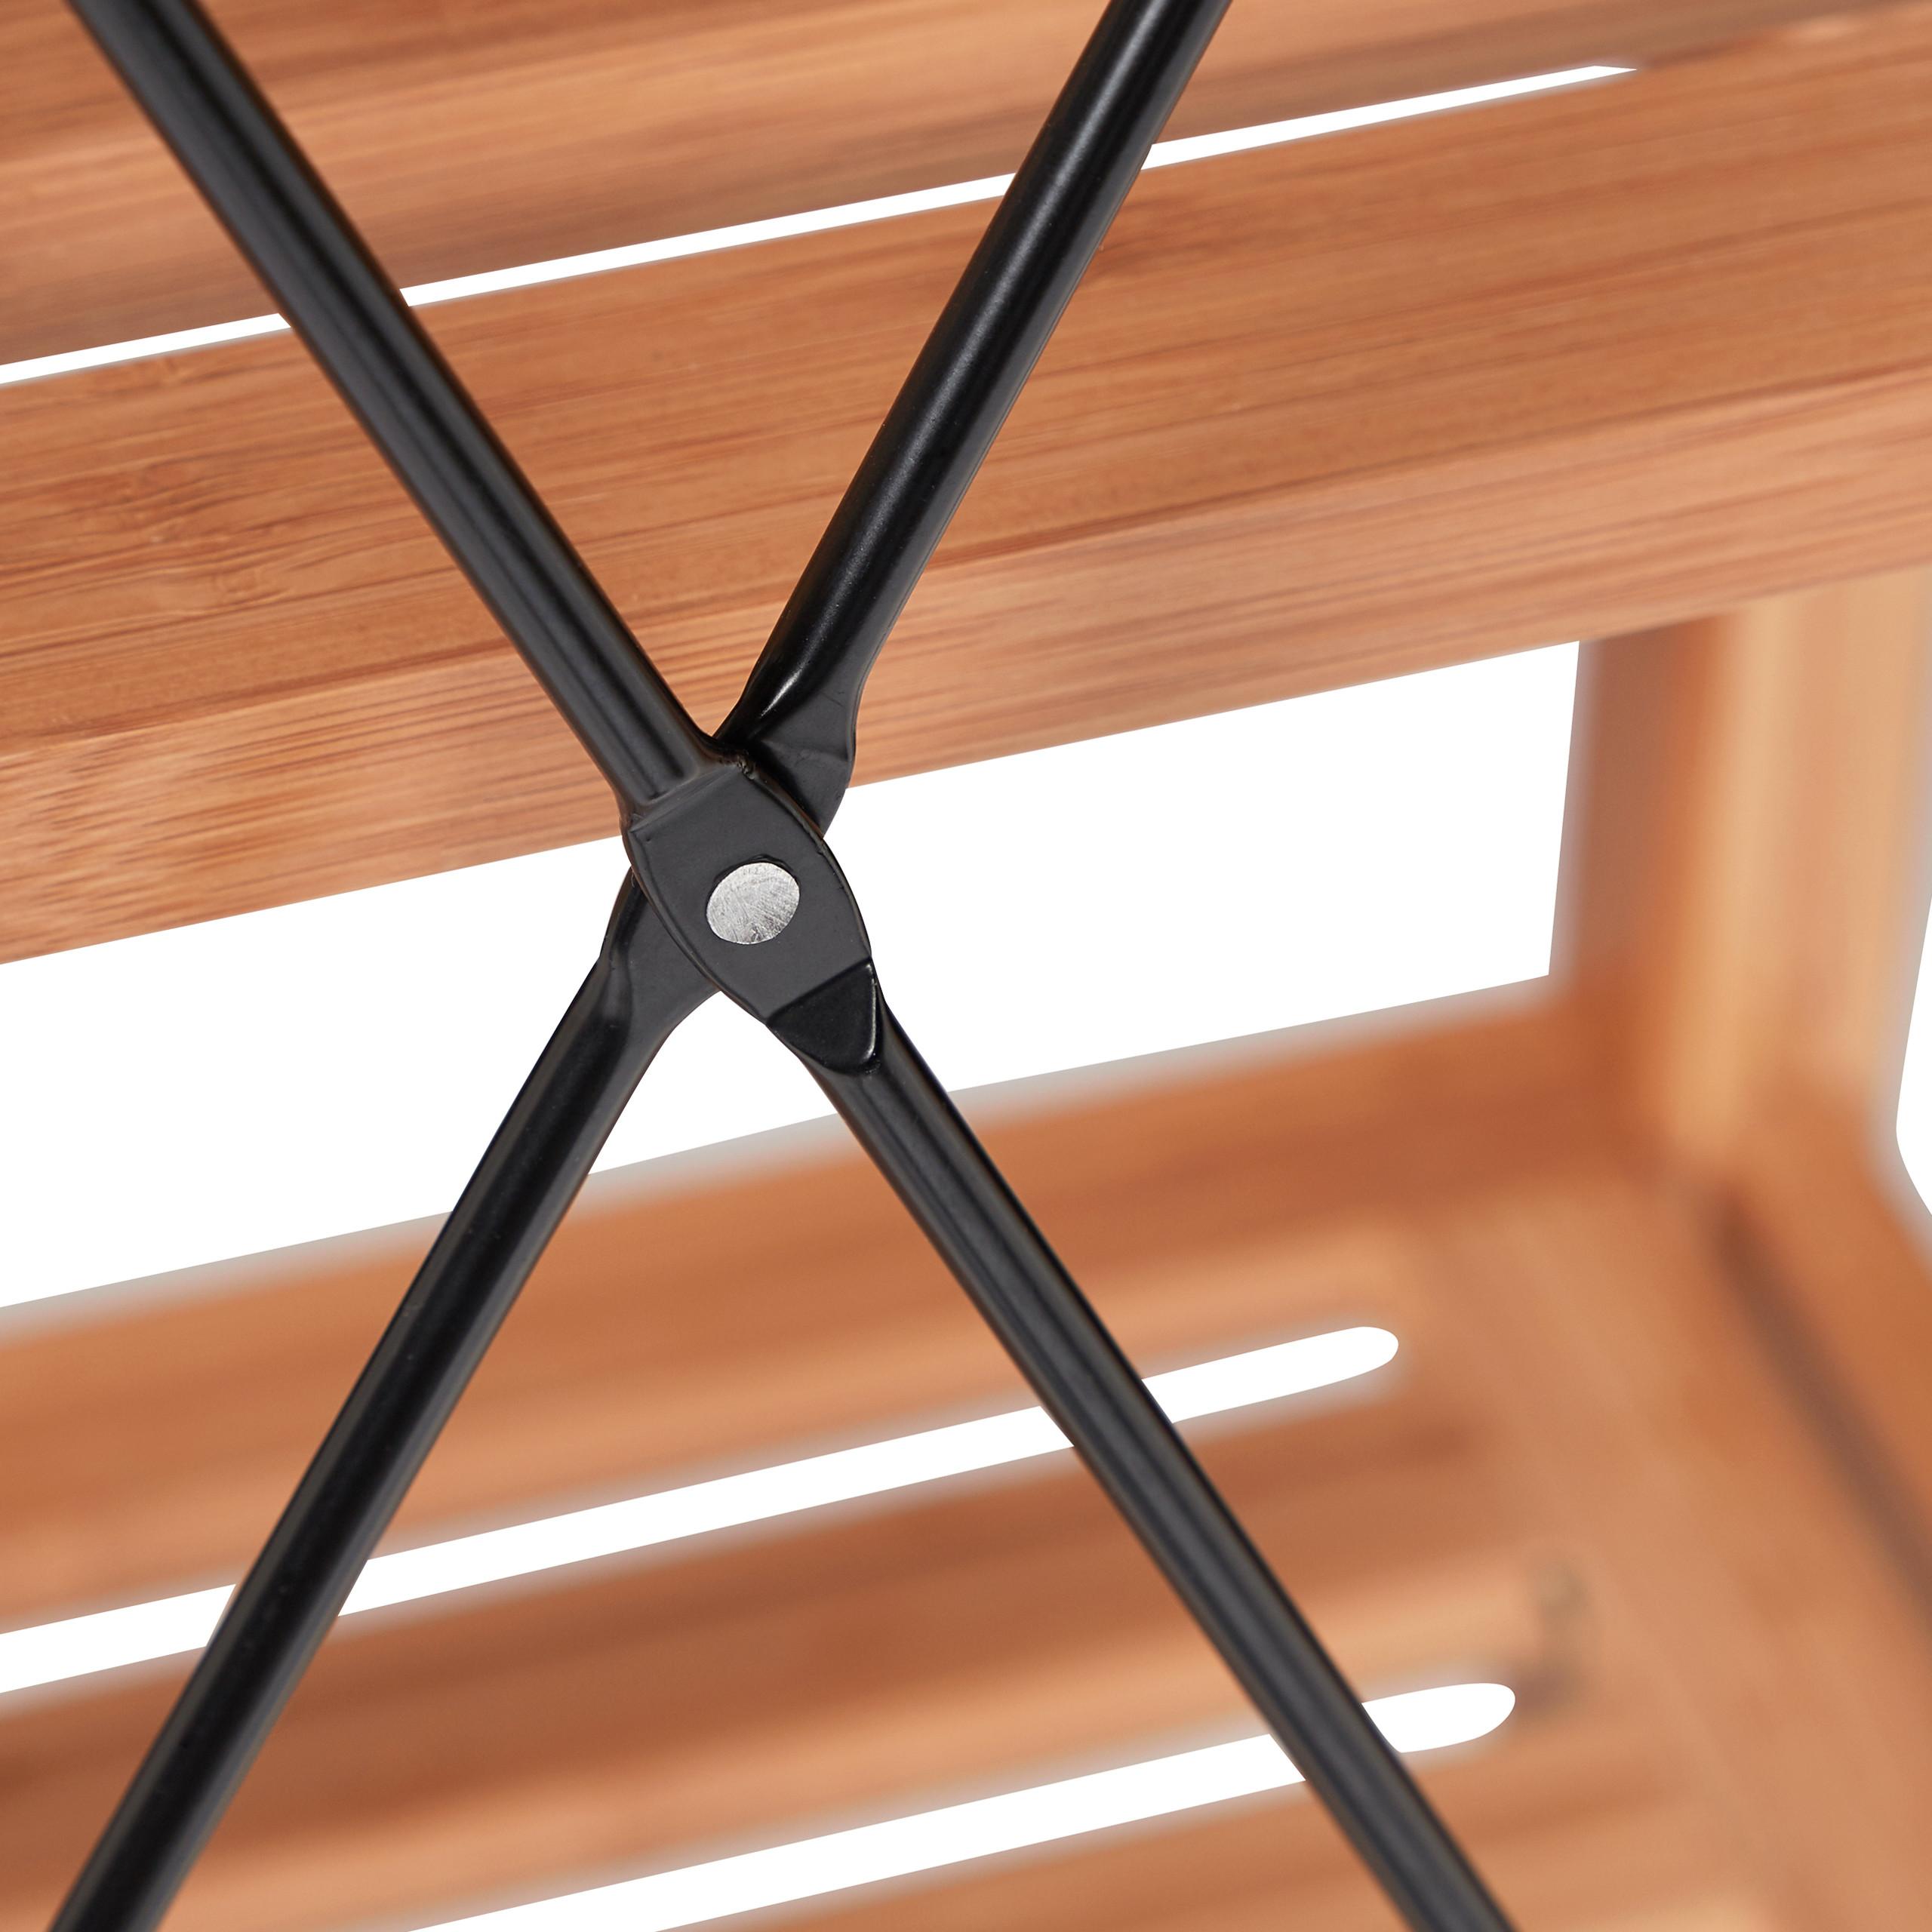 Bambusregal-Deluxe-Stehregal-natur-Standregal-Regal-Bambus-Lagerregal-Badregal Indexbild 16